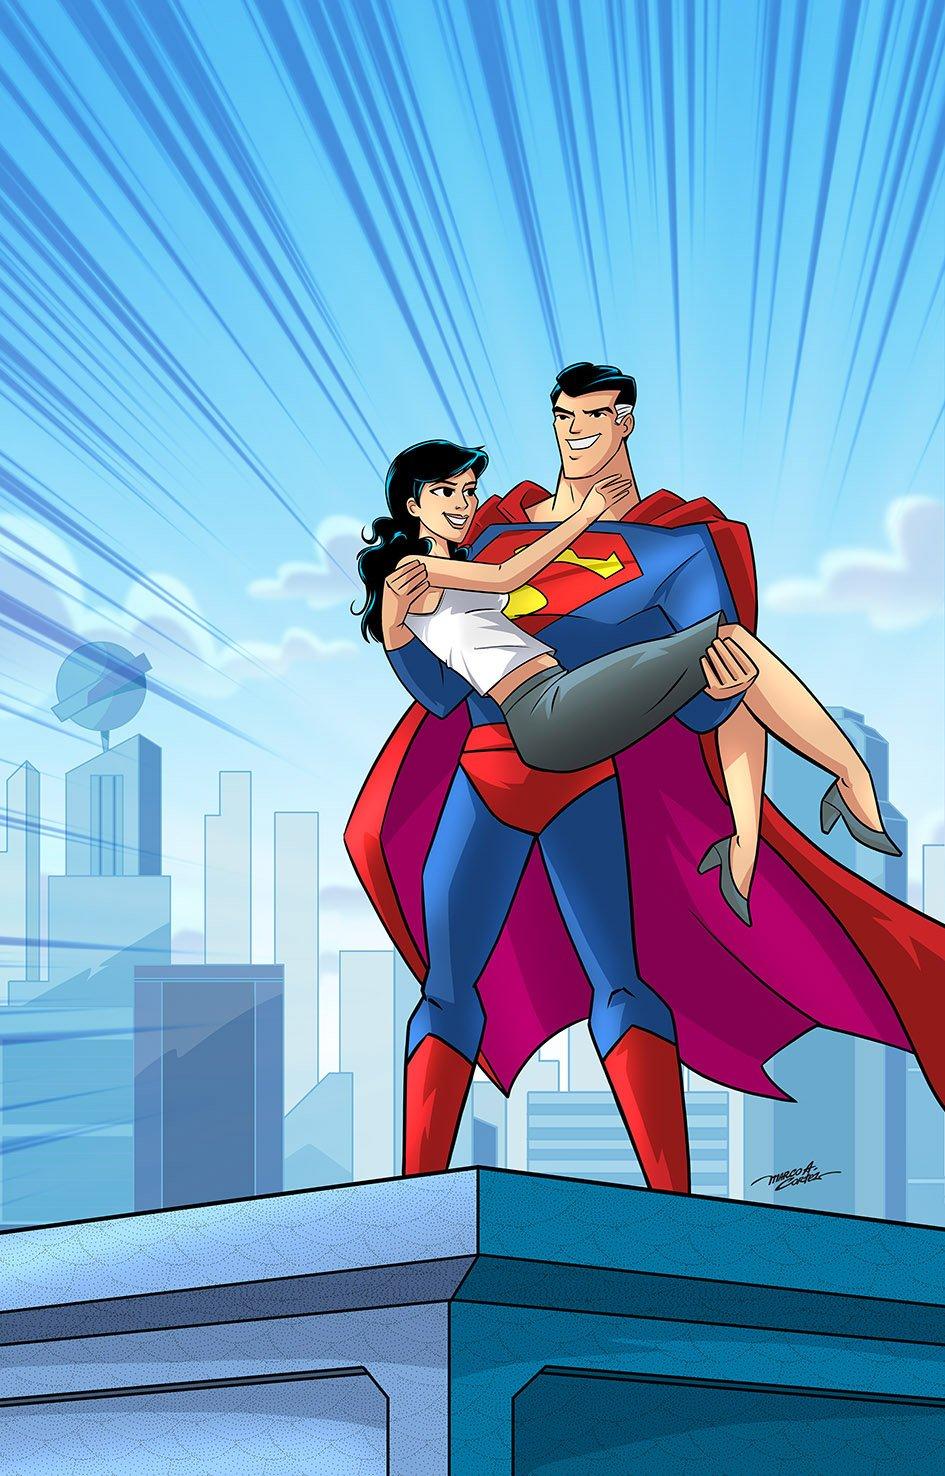 LANE & KENT~* Clark/Superman & Lois relationship... - Page 1103